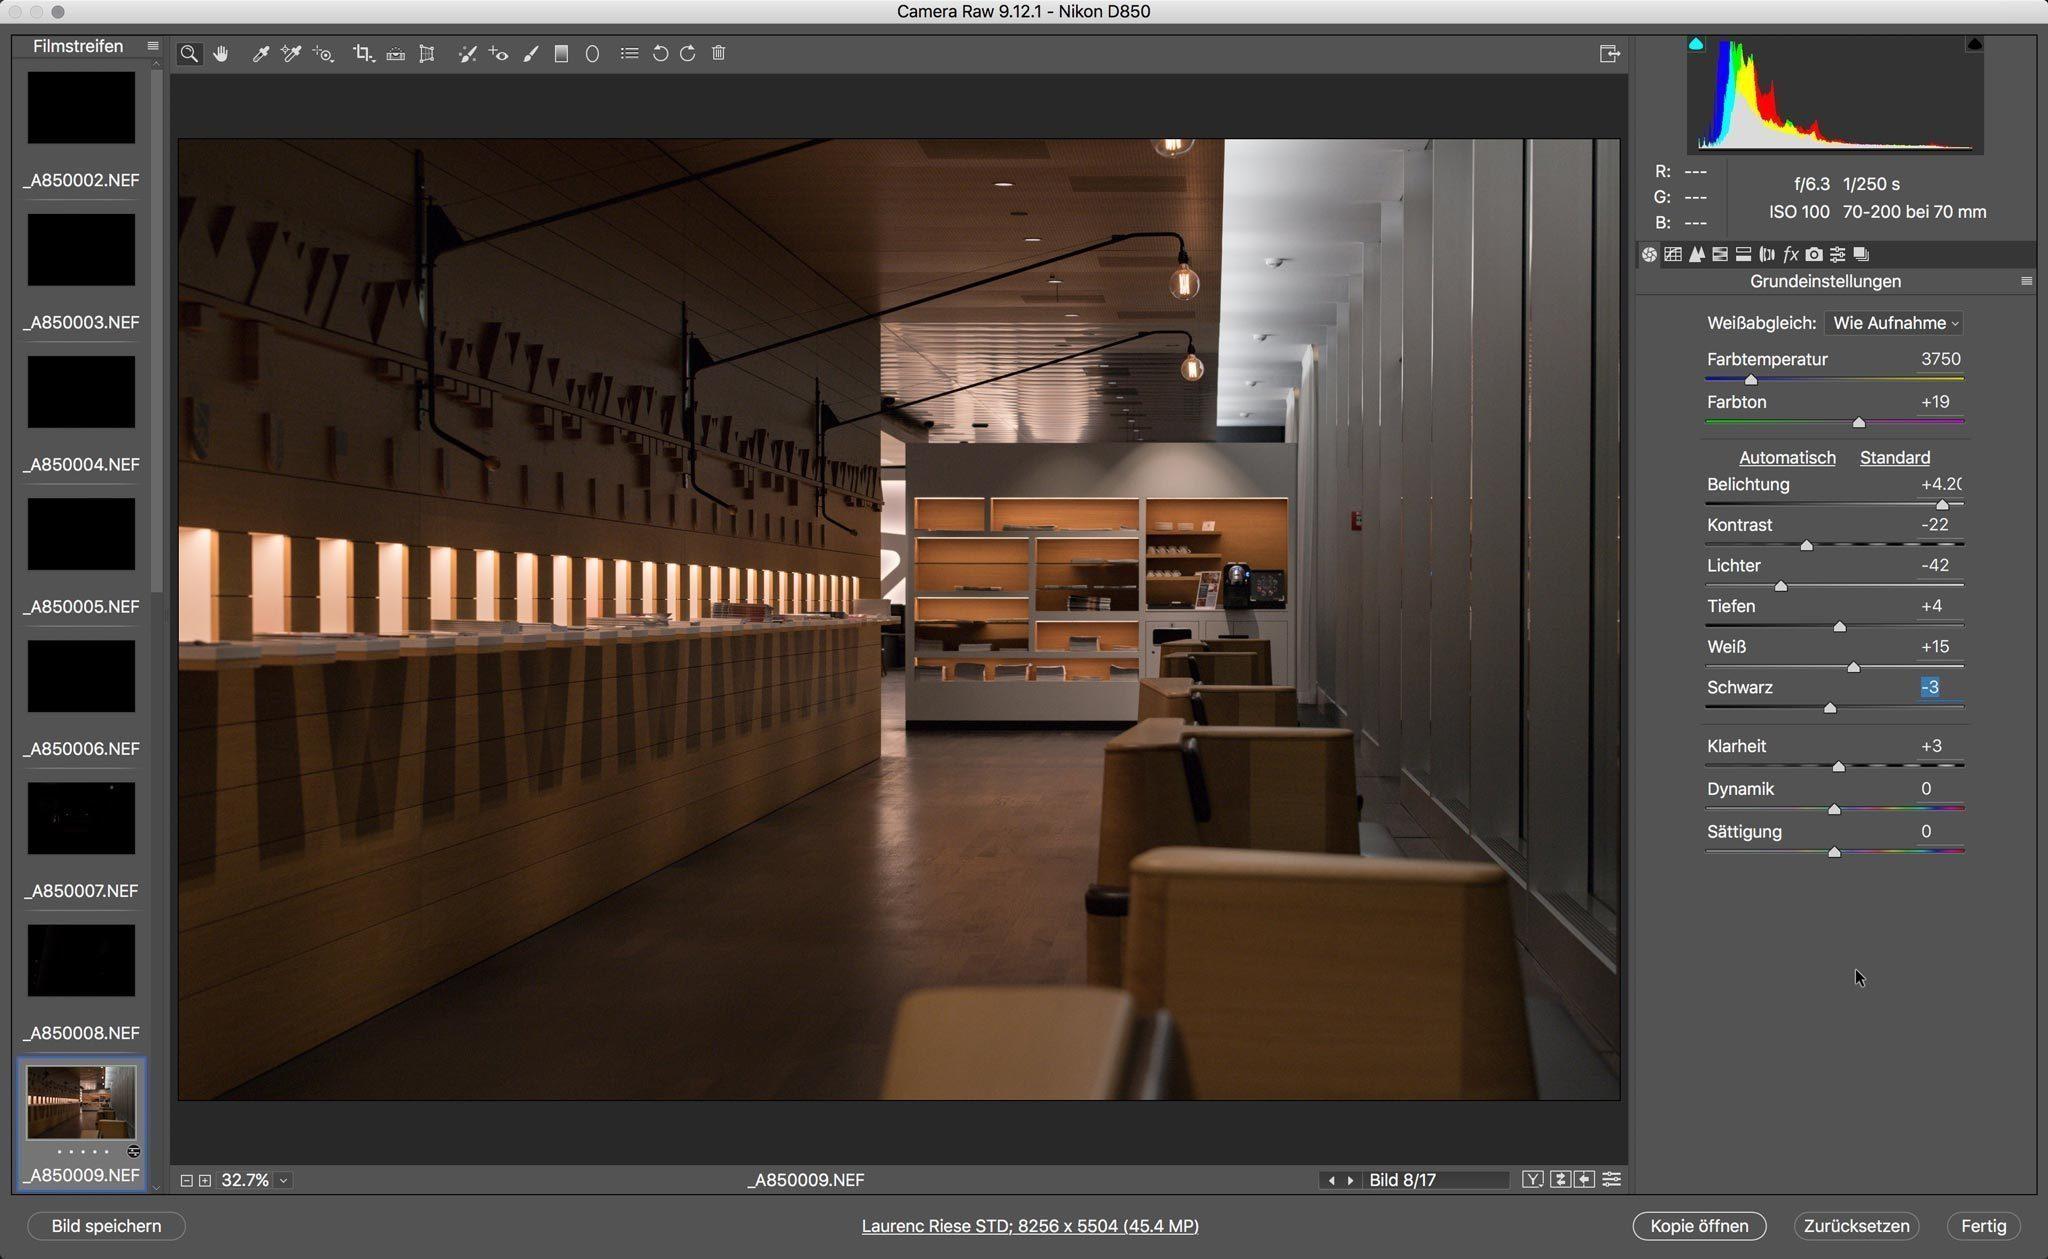 Adobe-RAW-Konverter-mit-Nikon-D850-Entwickelt